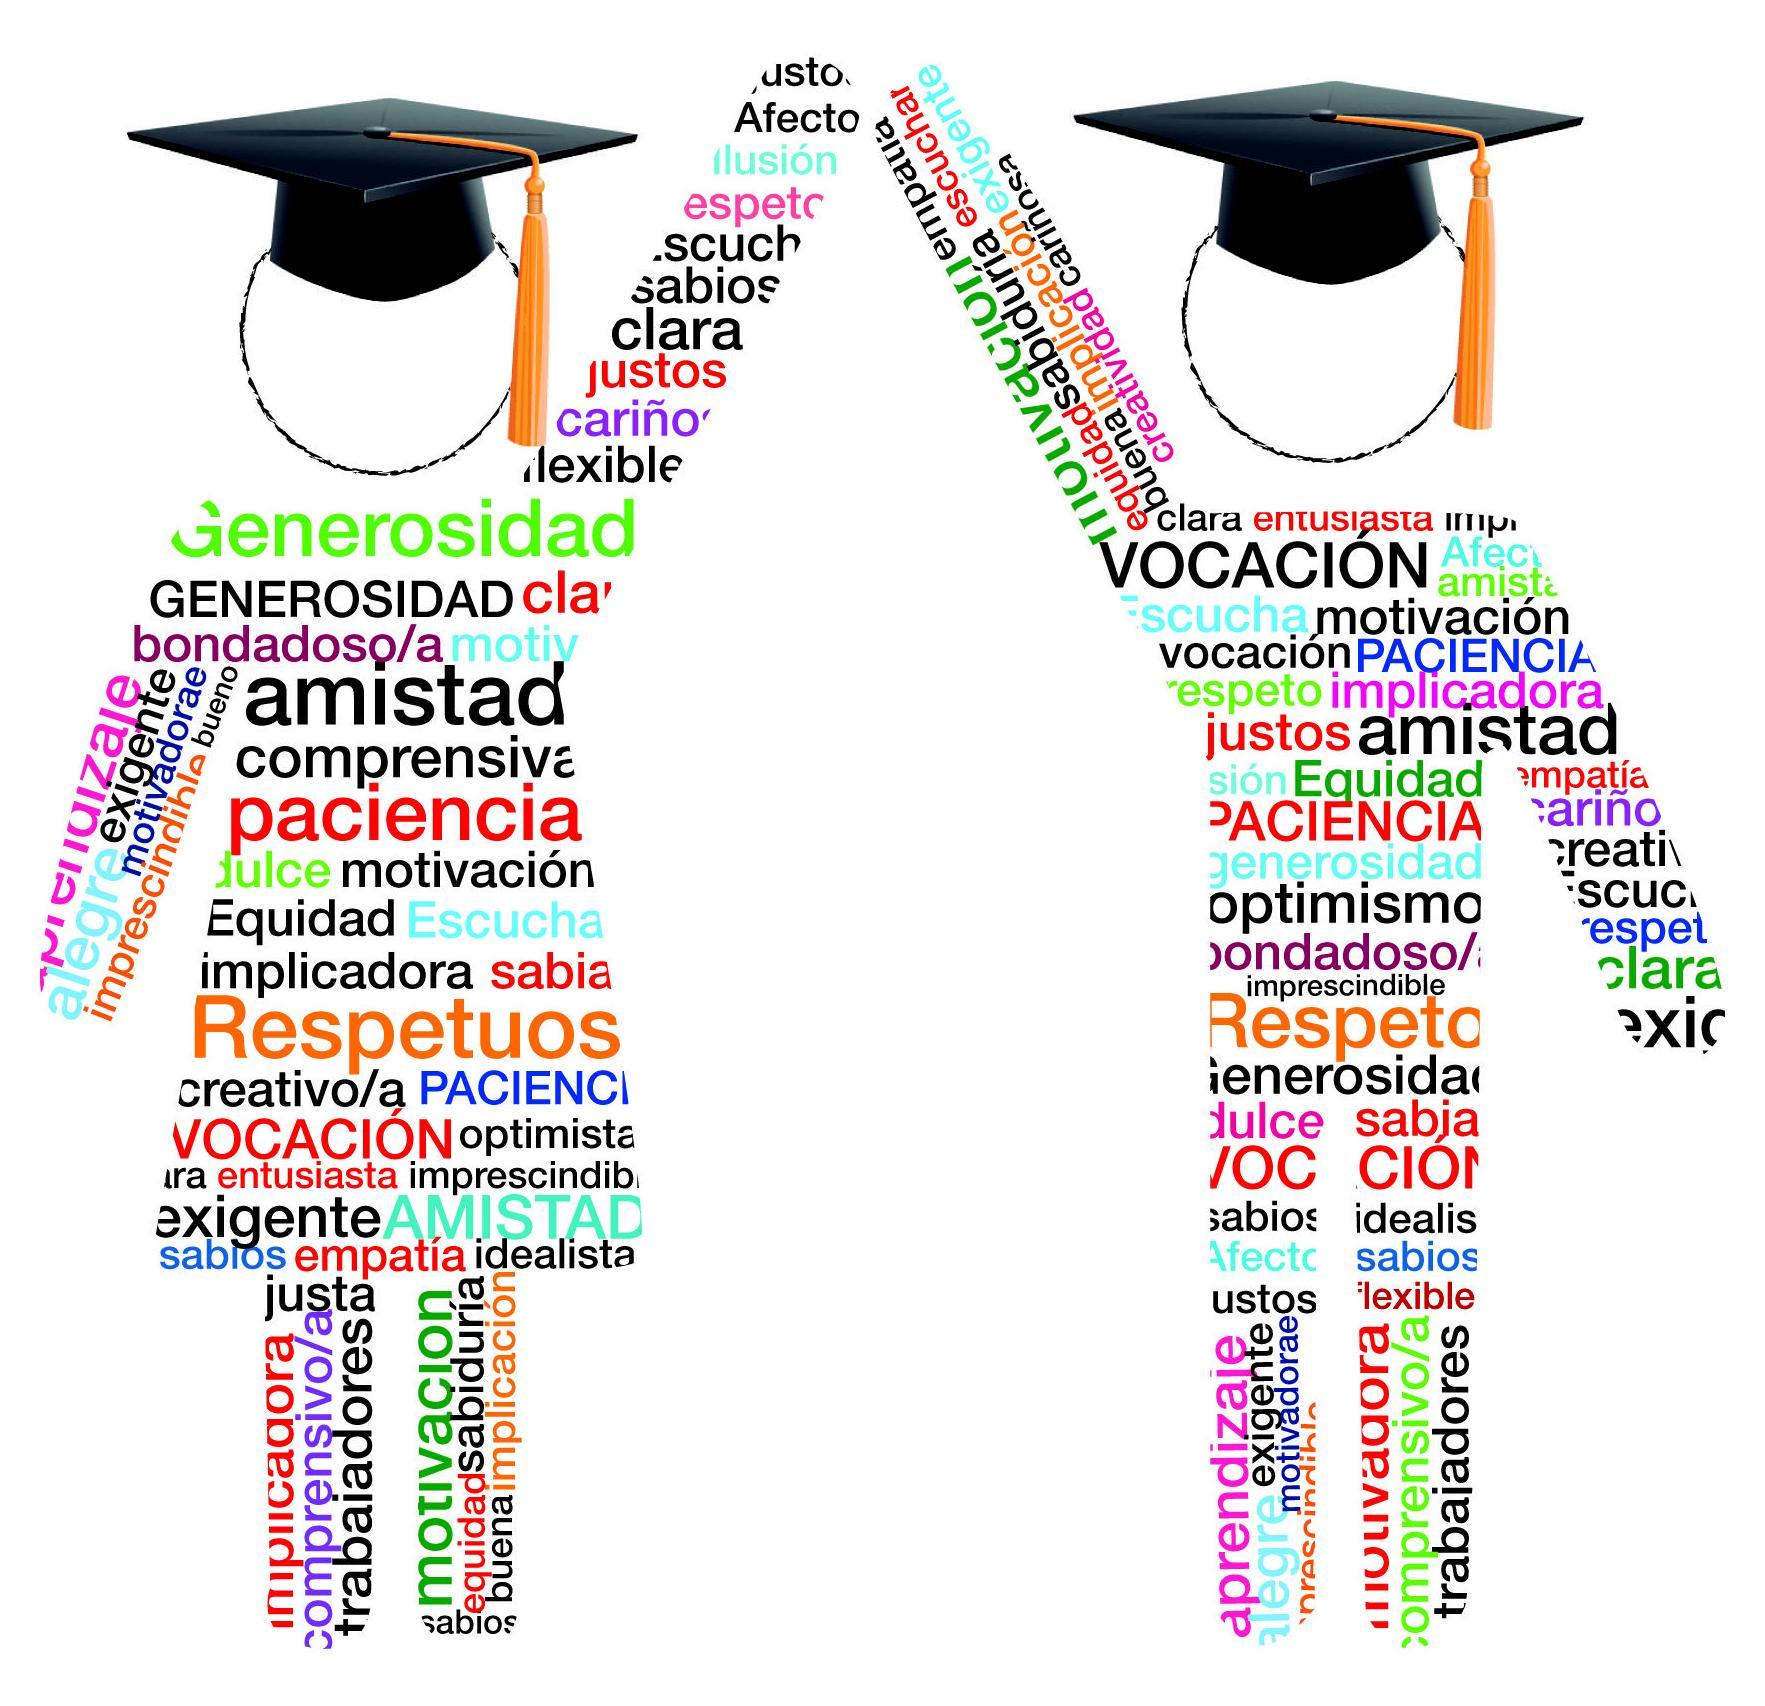 GABINETE PSICOLÓGICO: Relación de cursos de Academia Europa